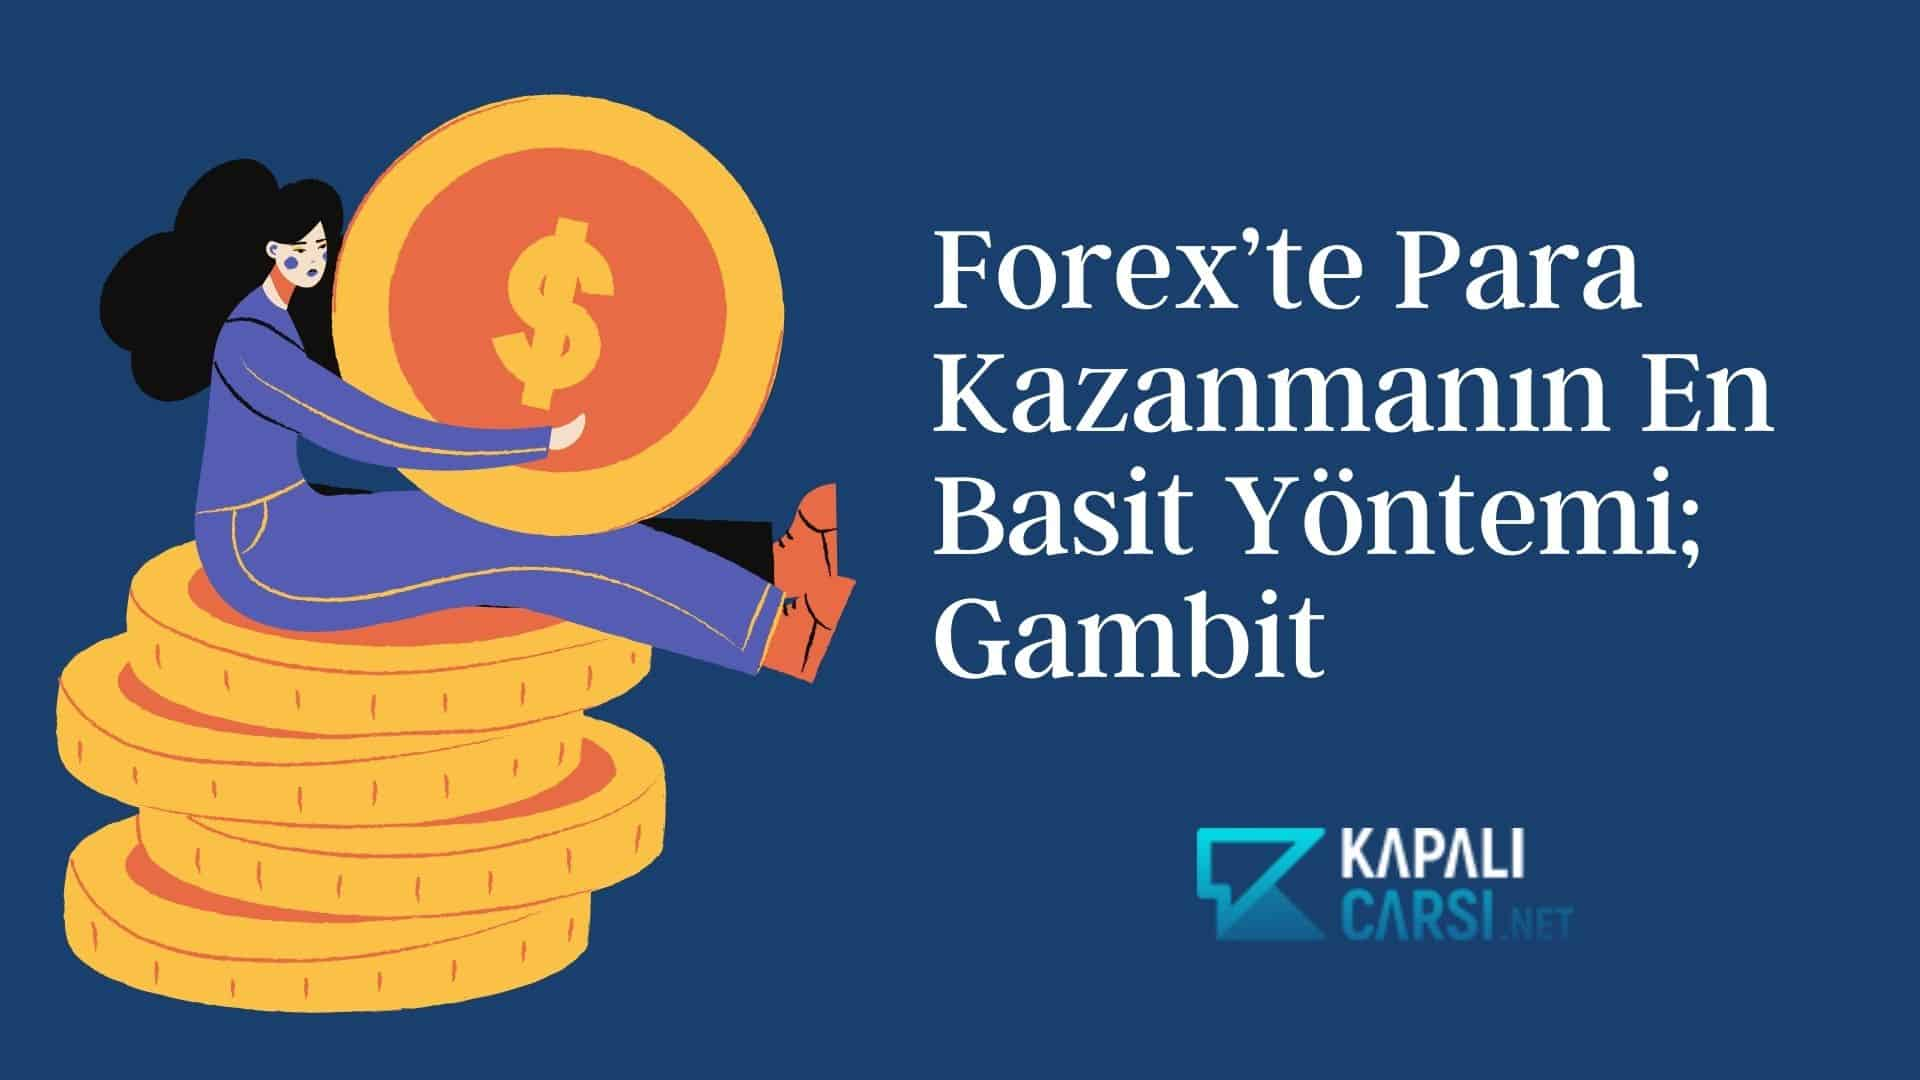 Forex'te Para Kazanmanın En Basit Yöntemi; Gambit